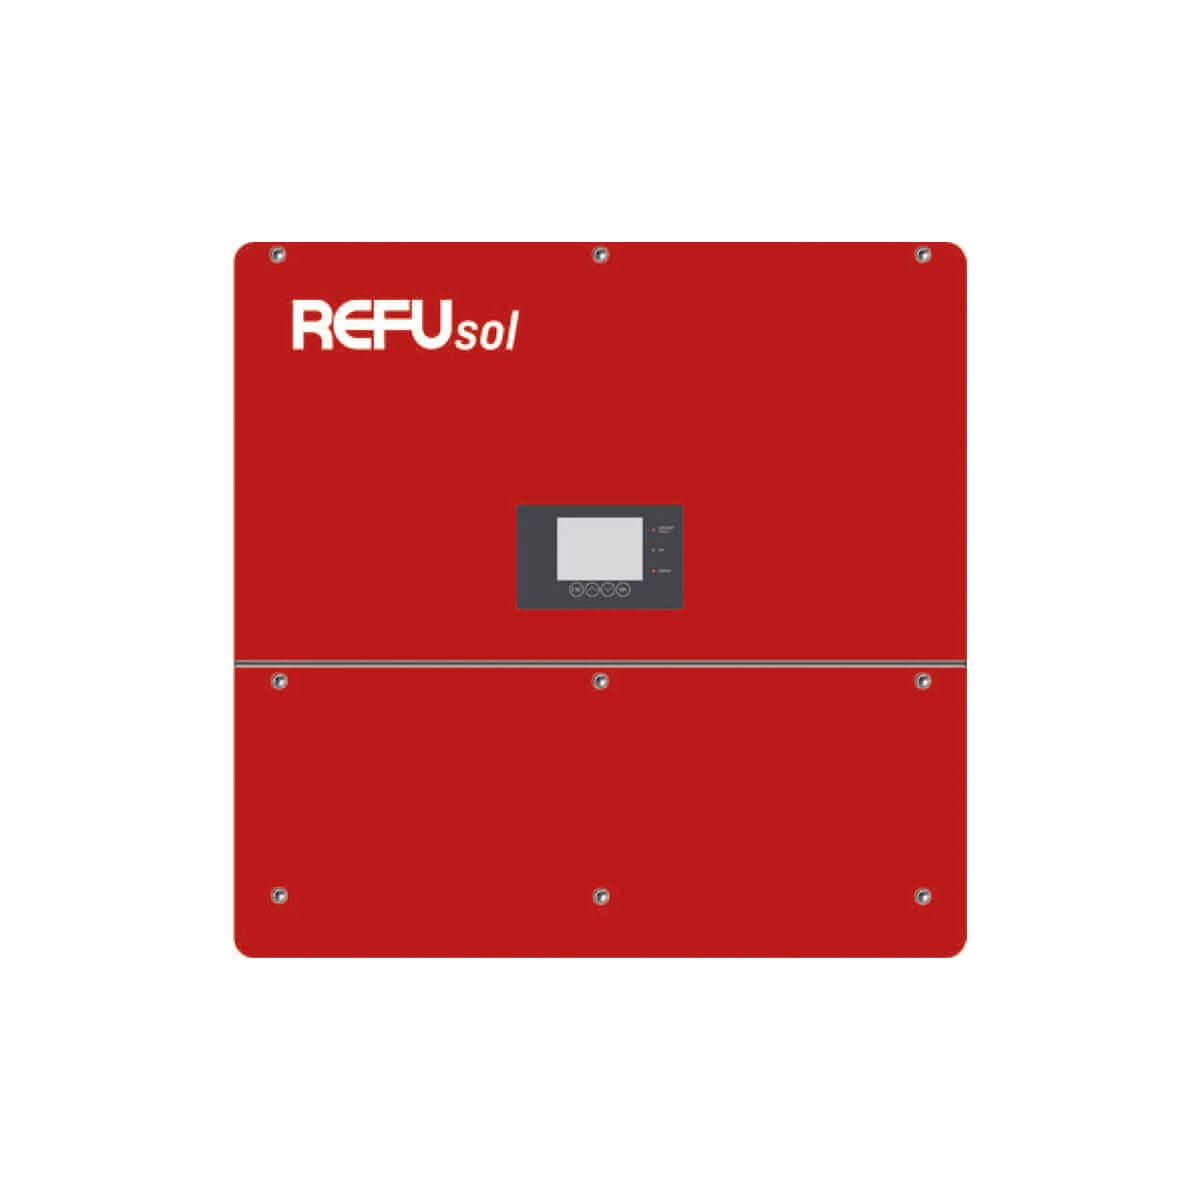 refusol 50kW inverter, refusol 50k-3t 50kW inverter, refusol 50k-3t inverter, refusol 50k-3t, refusol 50k-3t 50 kW